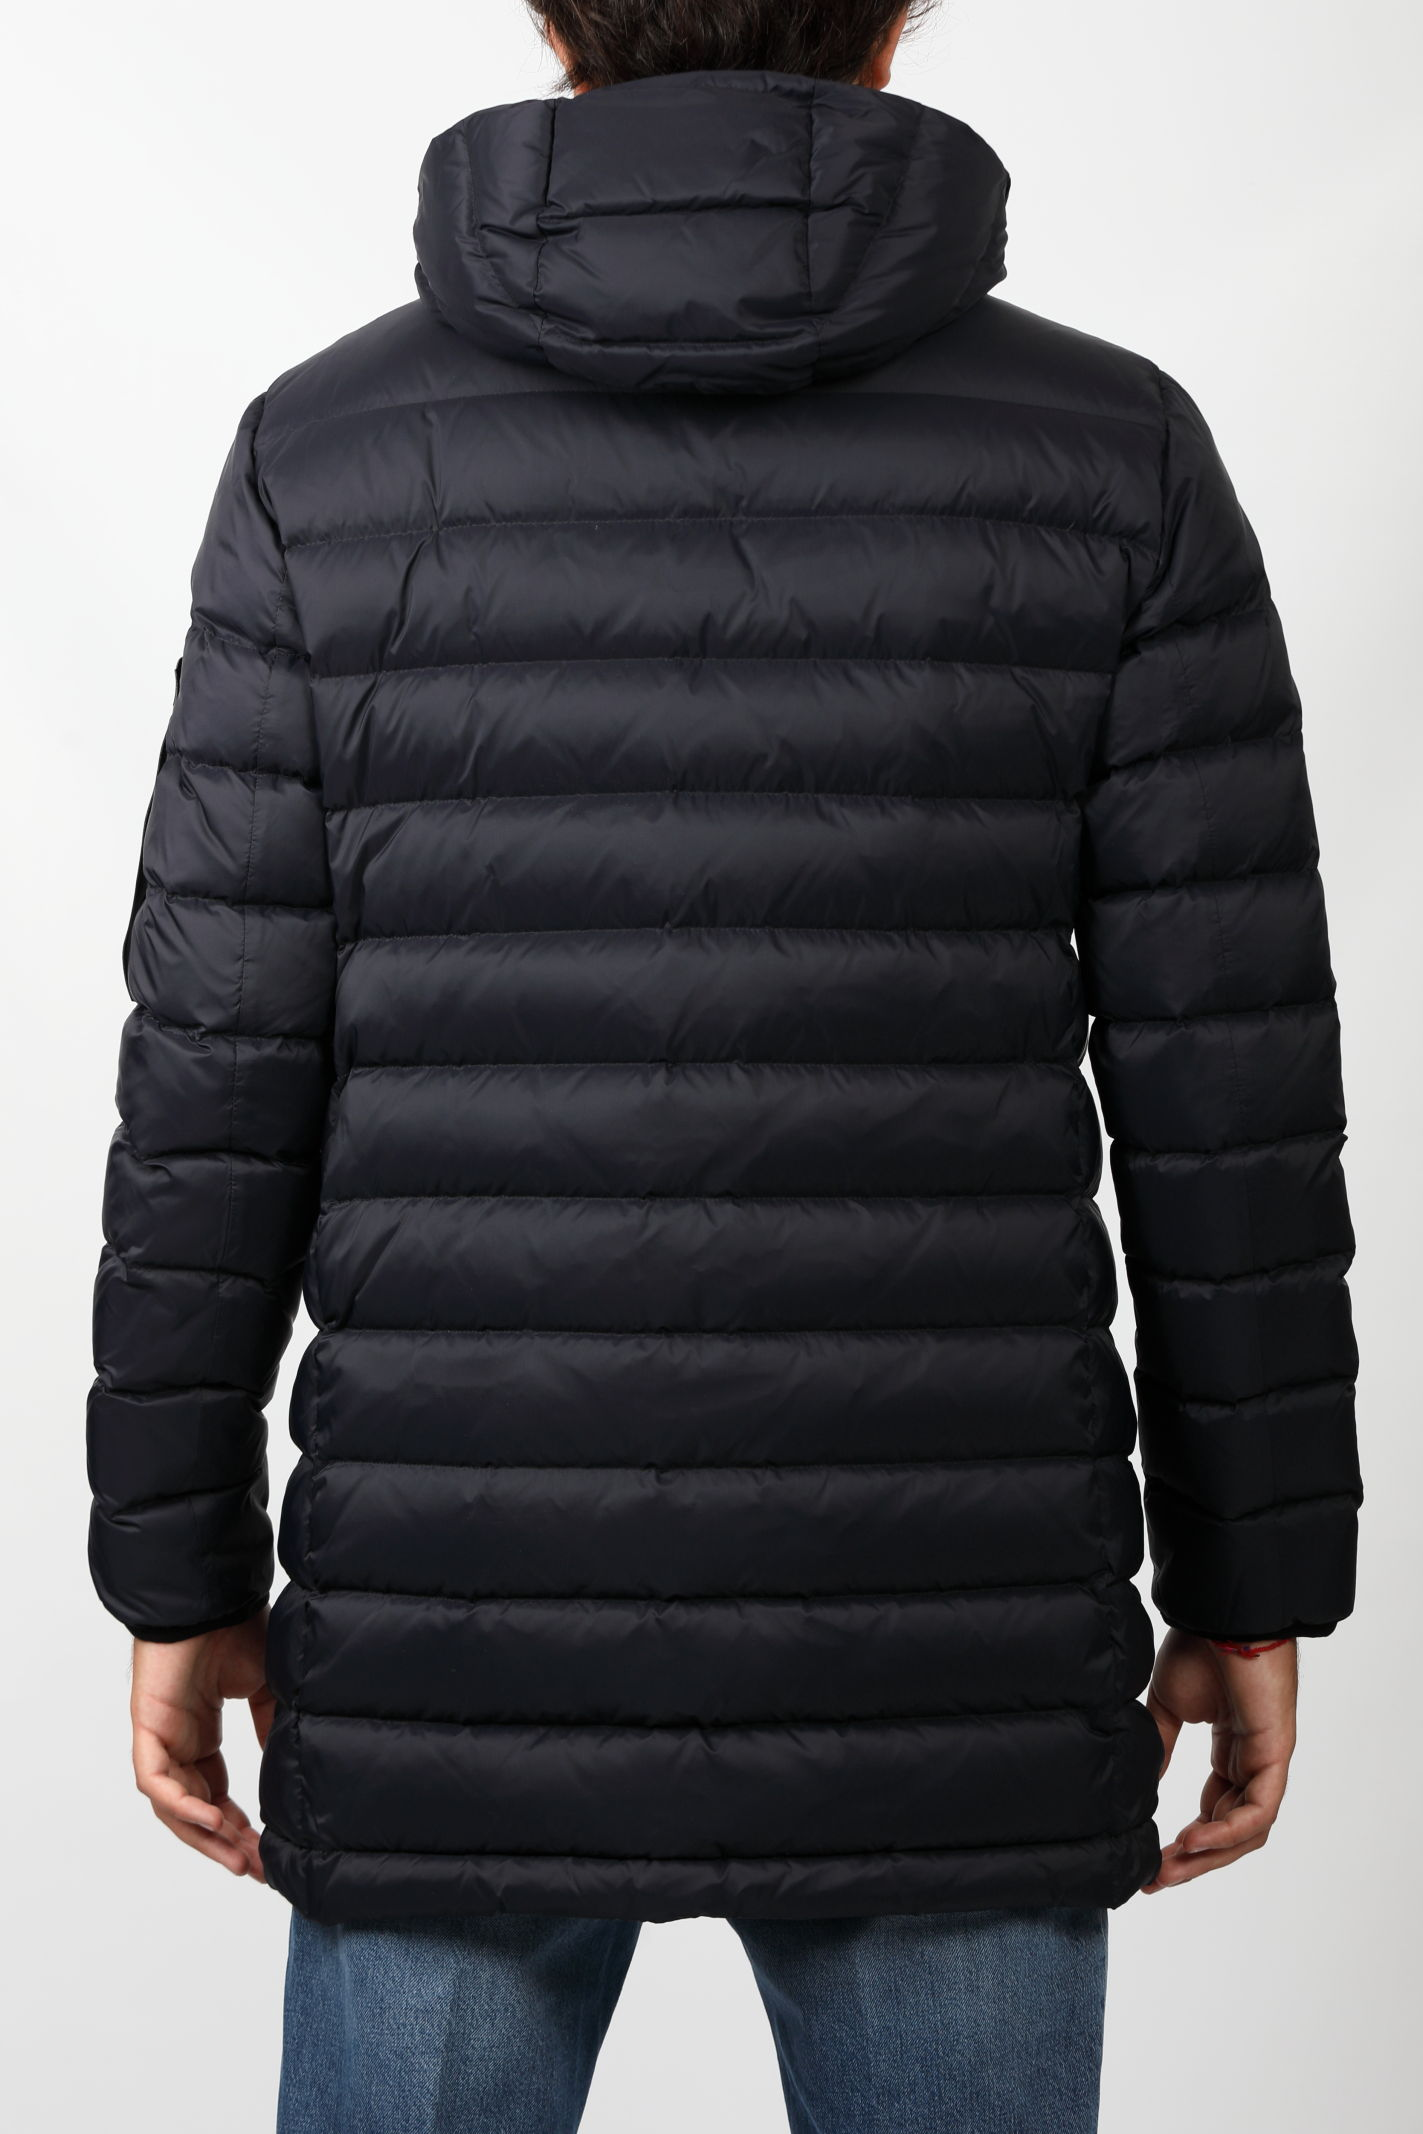 RUBIO KN PEUTEREY | Outerwear | PEU3749215BL